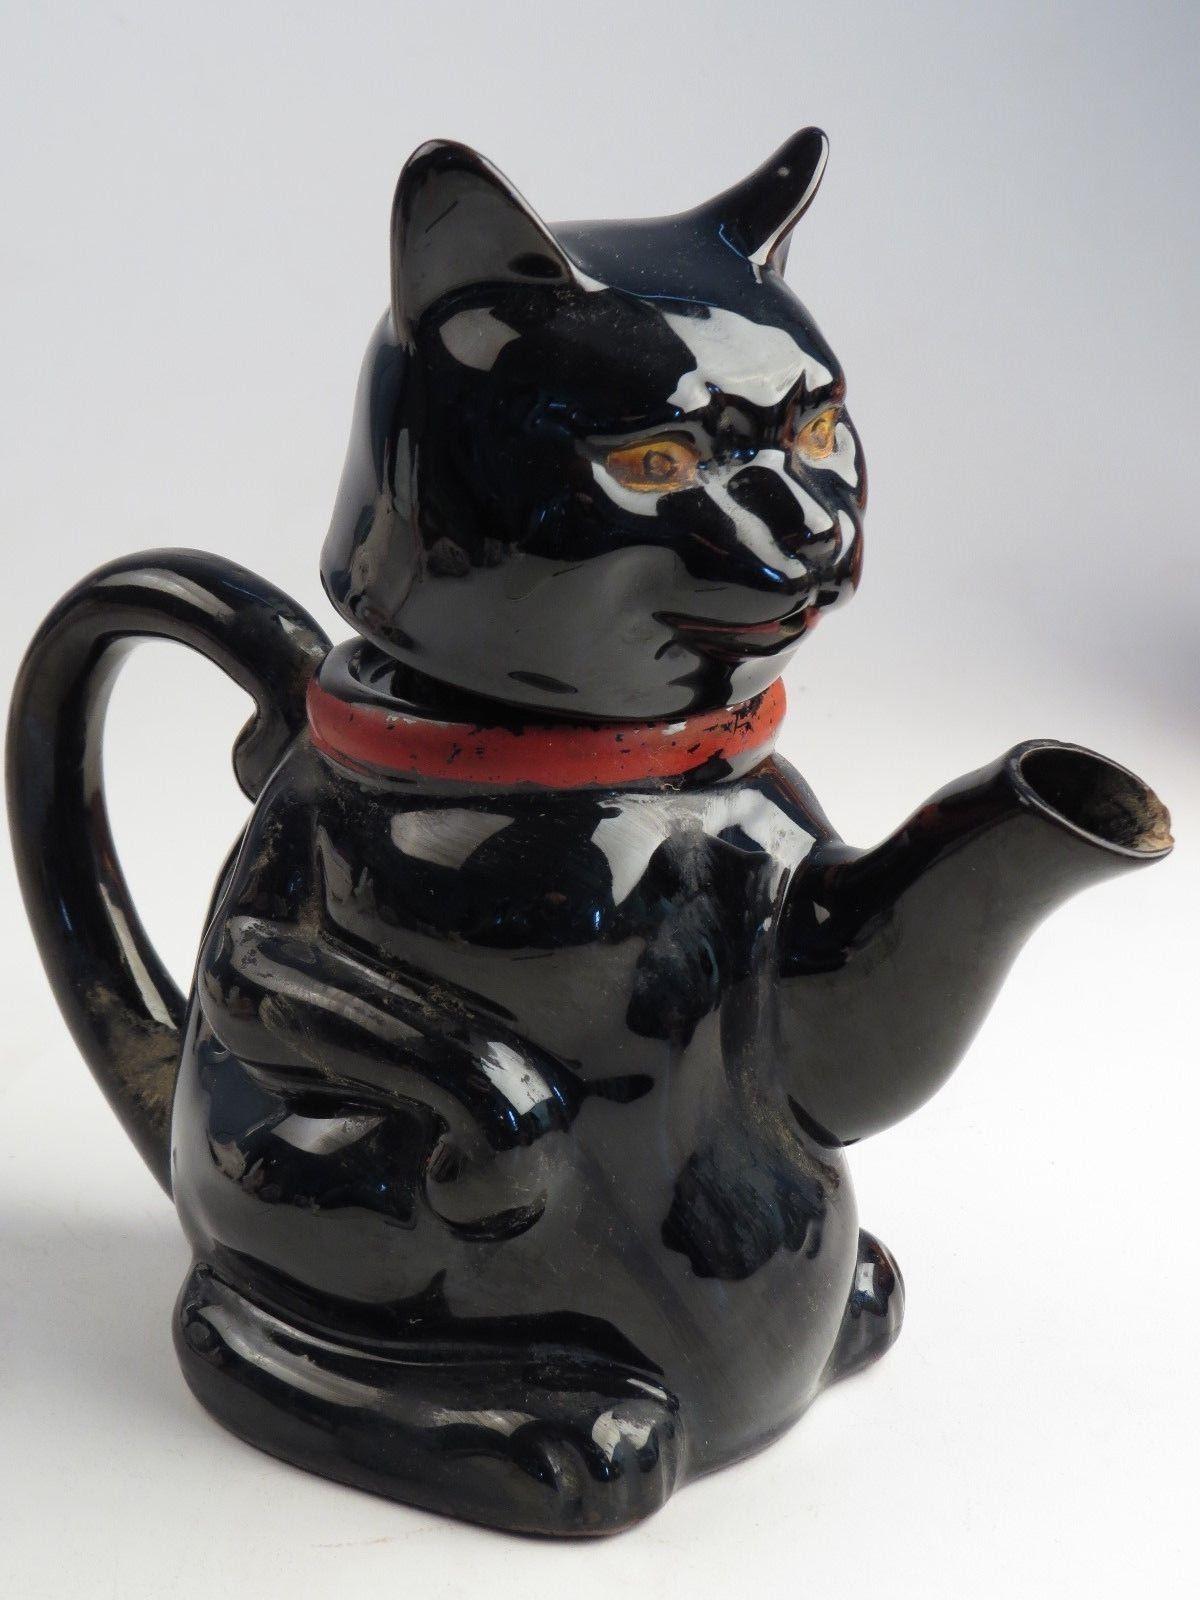 Vintage Black Cat Figurine Statue Porcelain Pottery Ceramic Tea